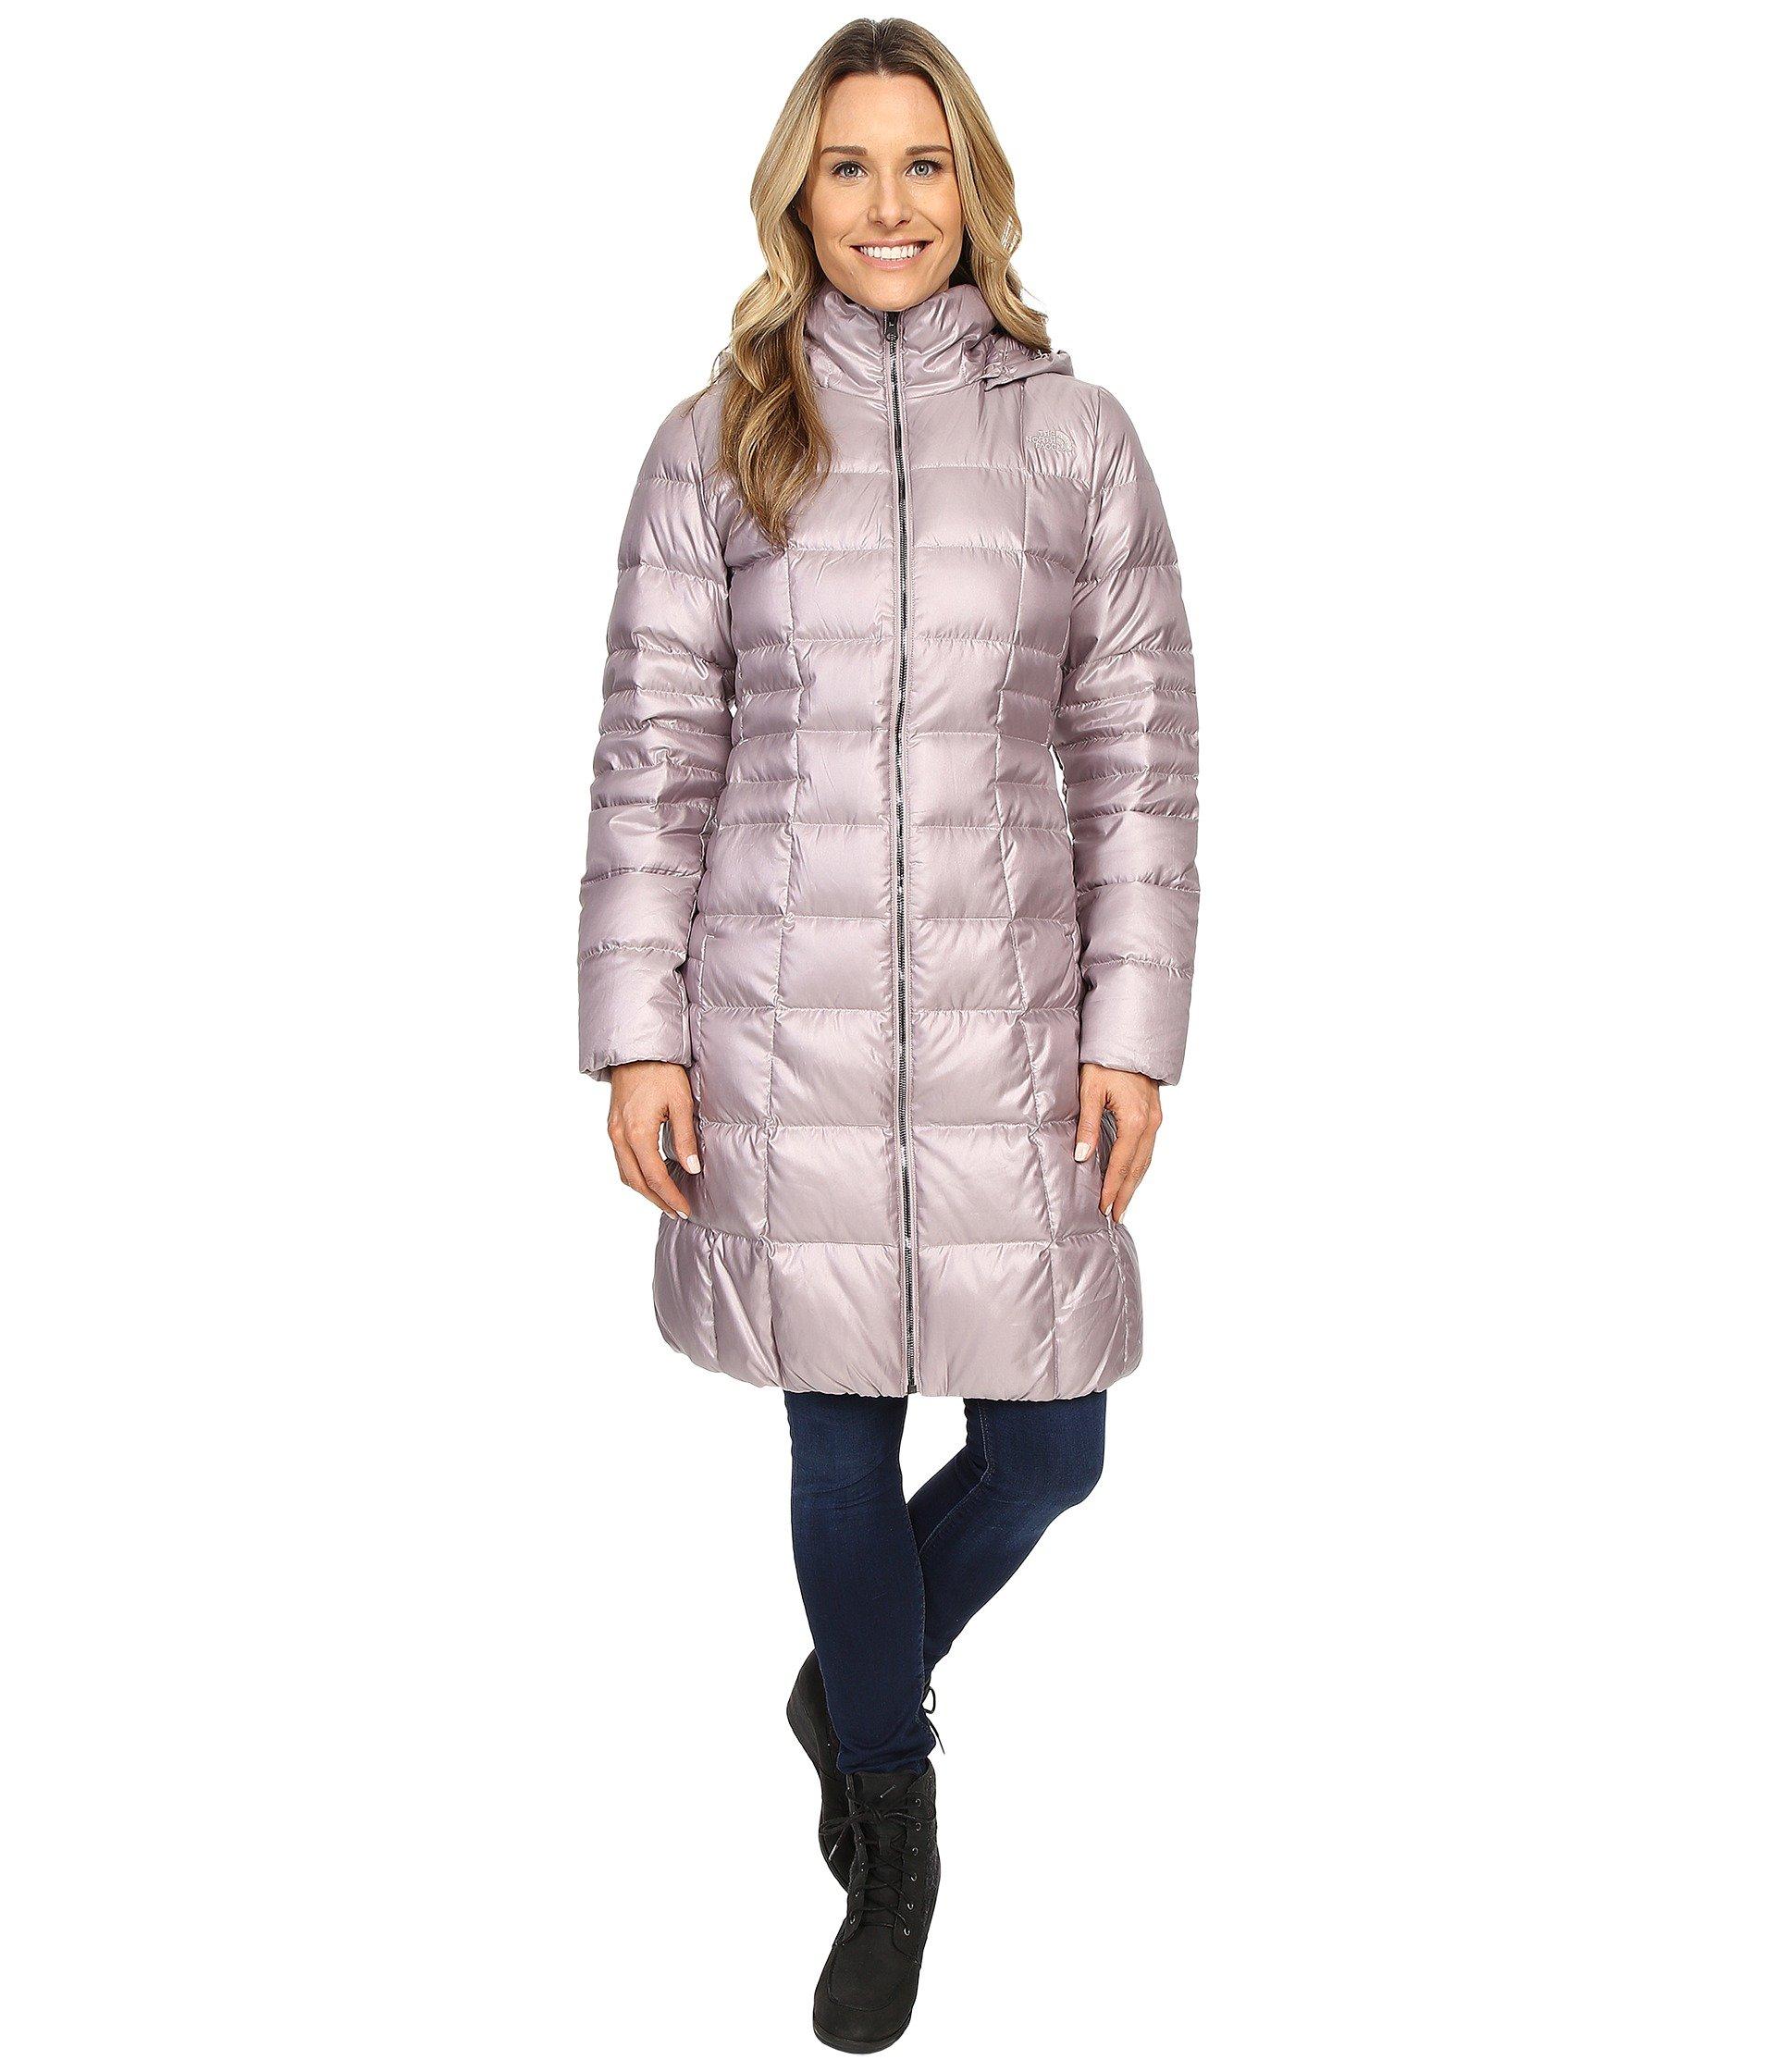 The North Face Metropolis Parka 2 Jacket - Women's (Large, Quail Grey)